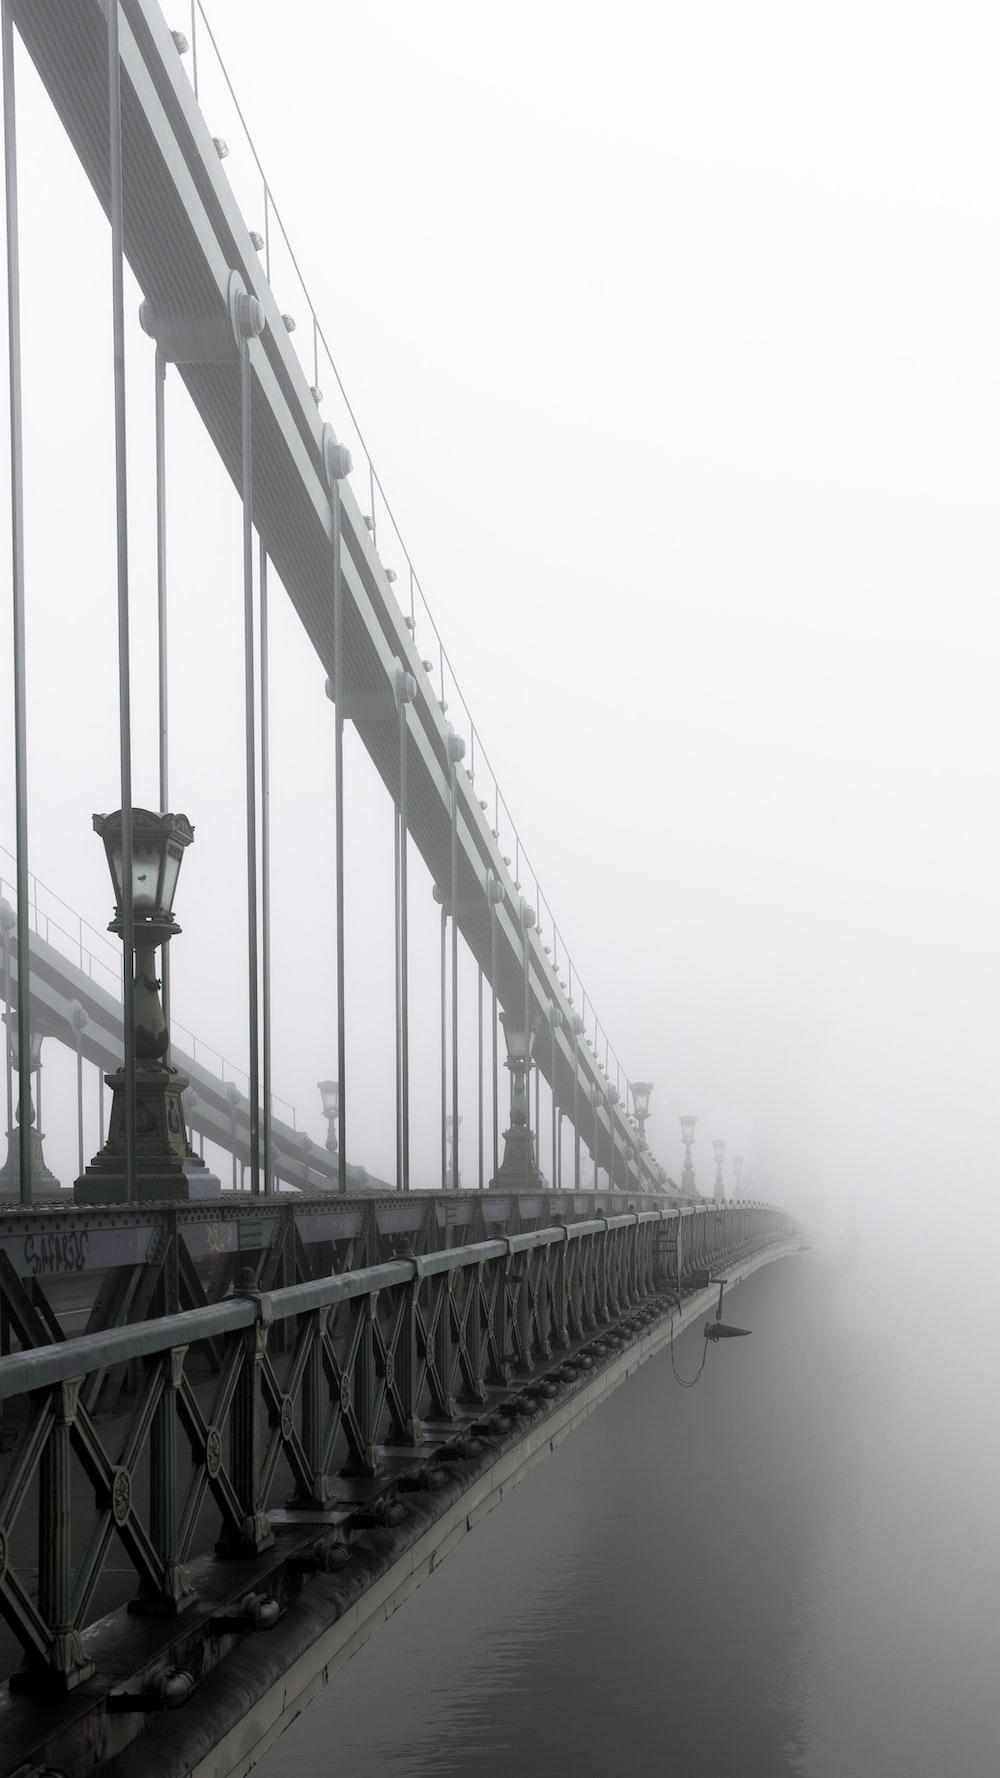 closeup photo of bridge and mist